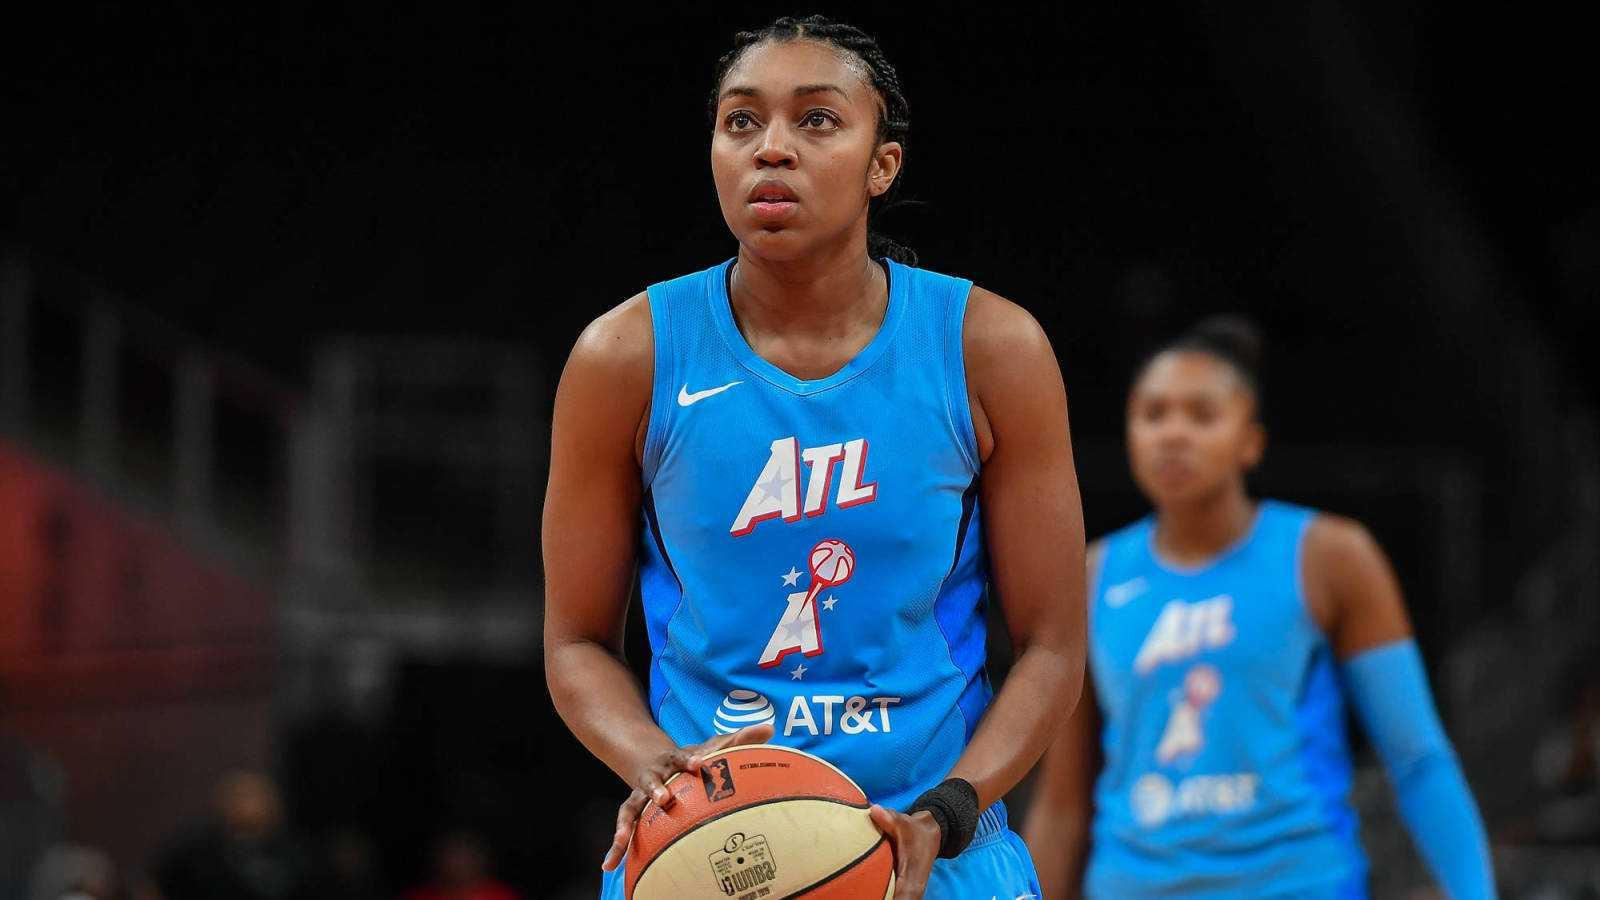 Atlanta Dream's Renee Montgomery Opts Out of 2020 WNBA Season